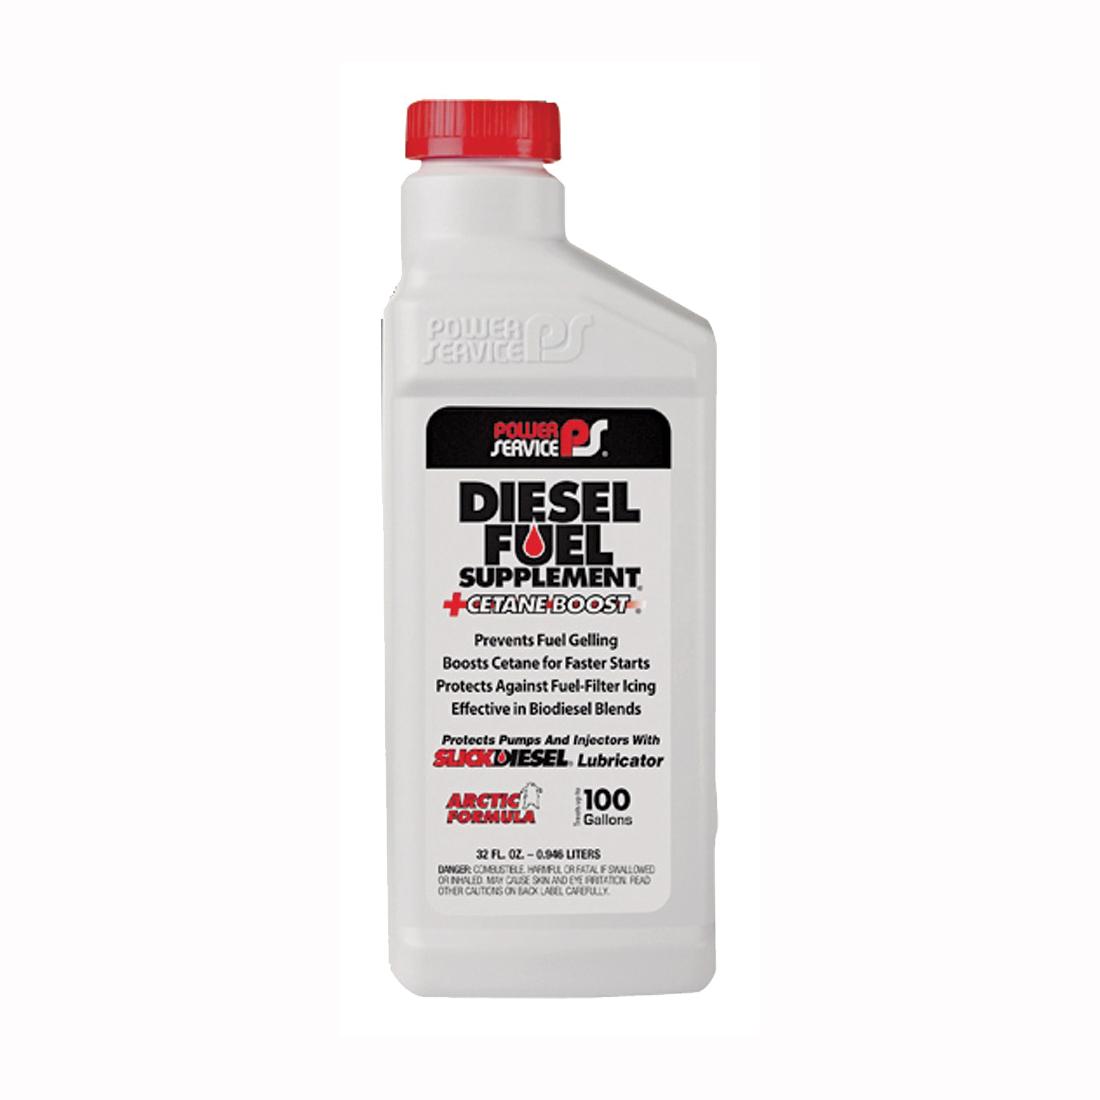 Picture of Warren PS1025 Diesel Fuel Supplement, 1 qt Package